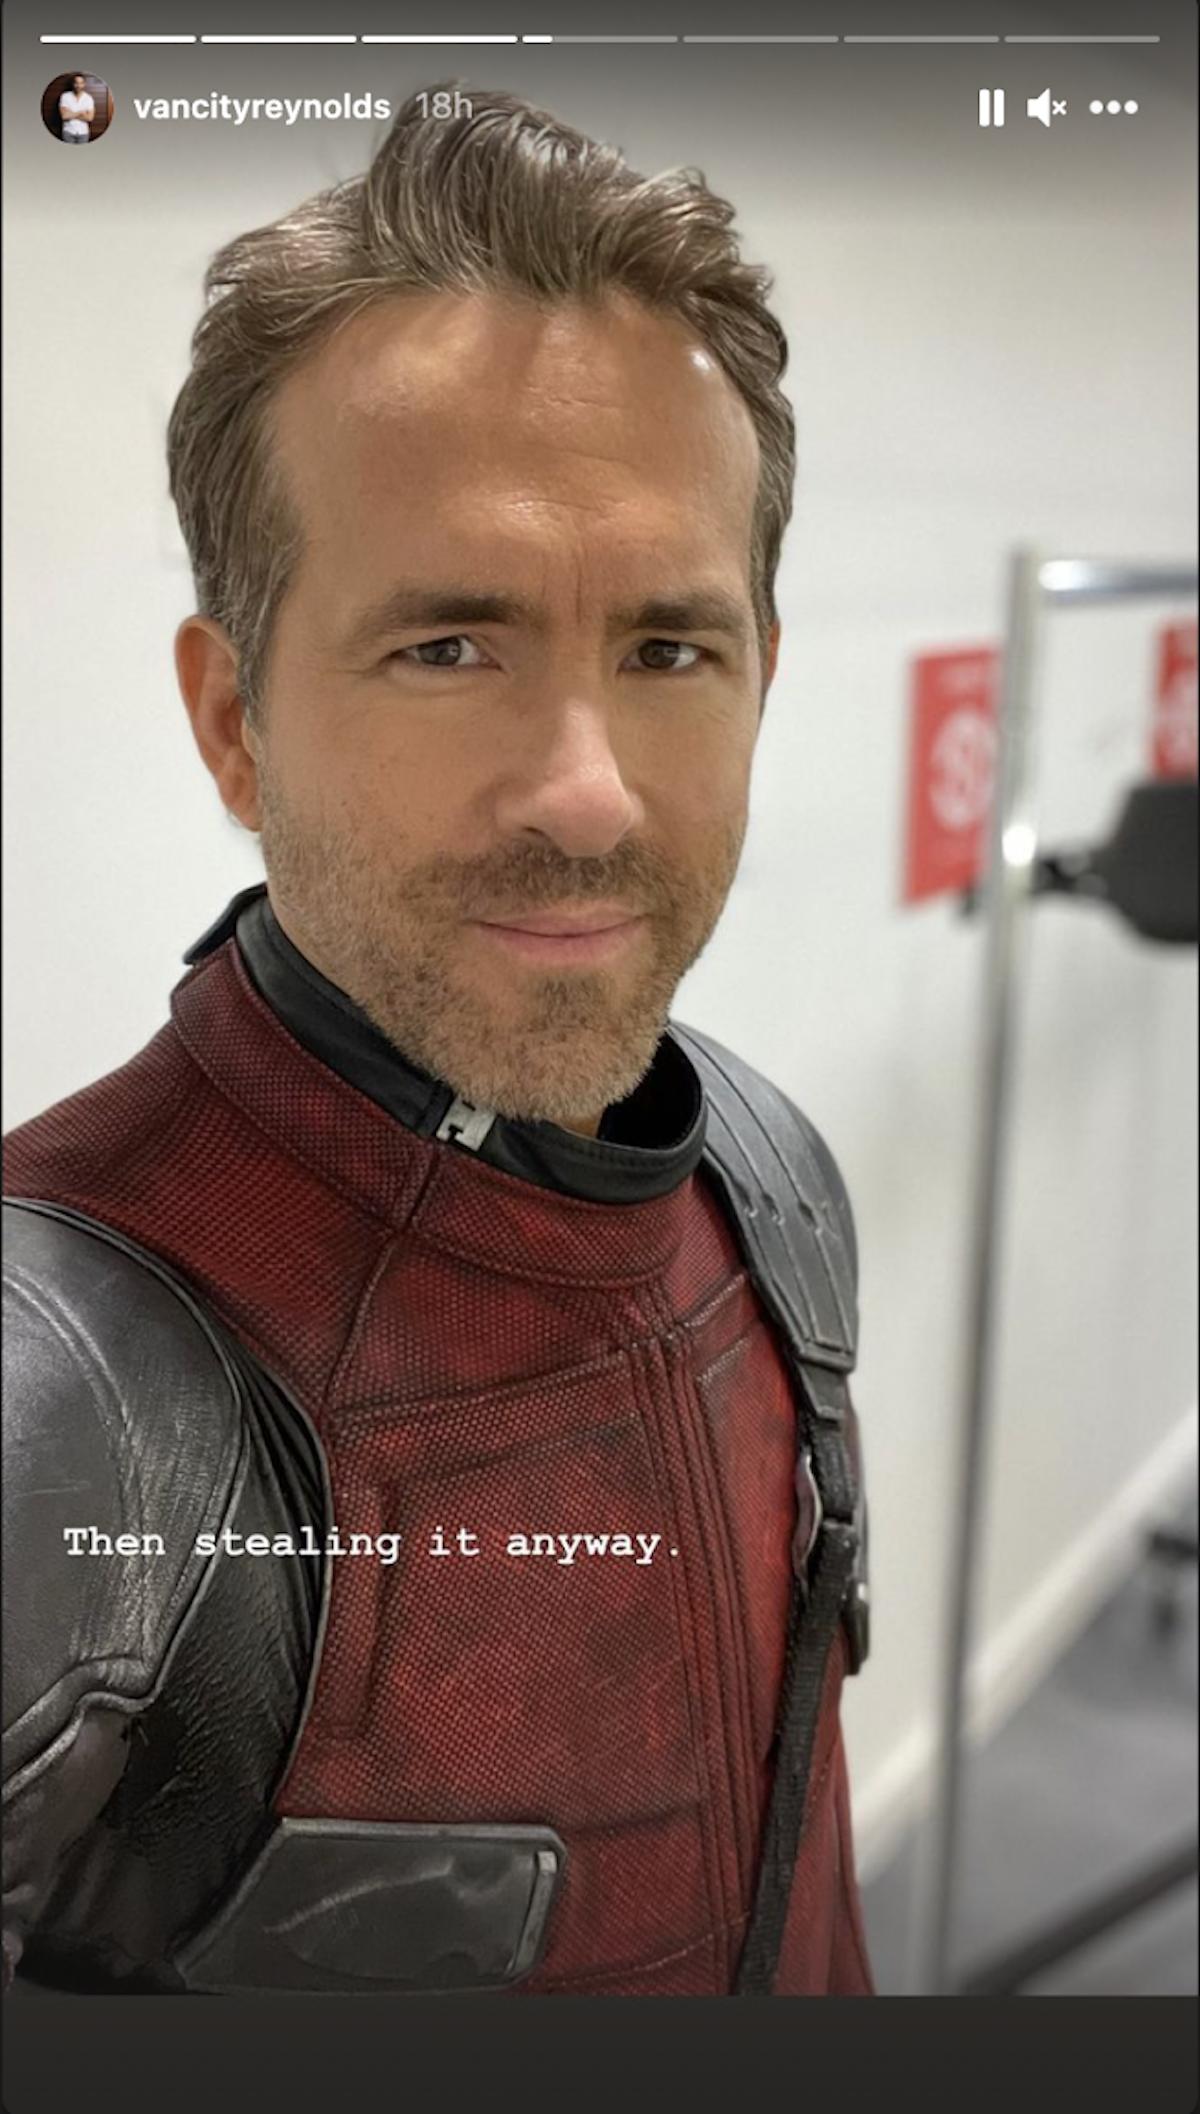 Ryan Reynolds deciding to steal Deadpool suit.